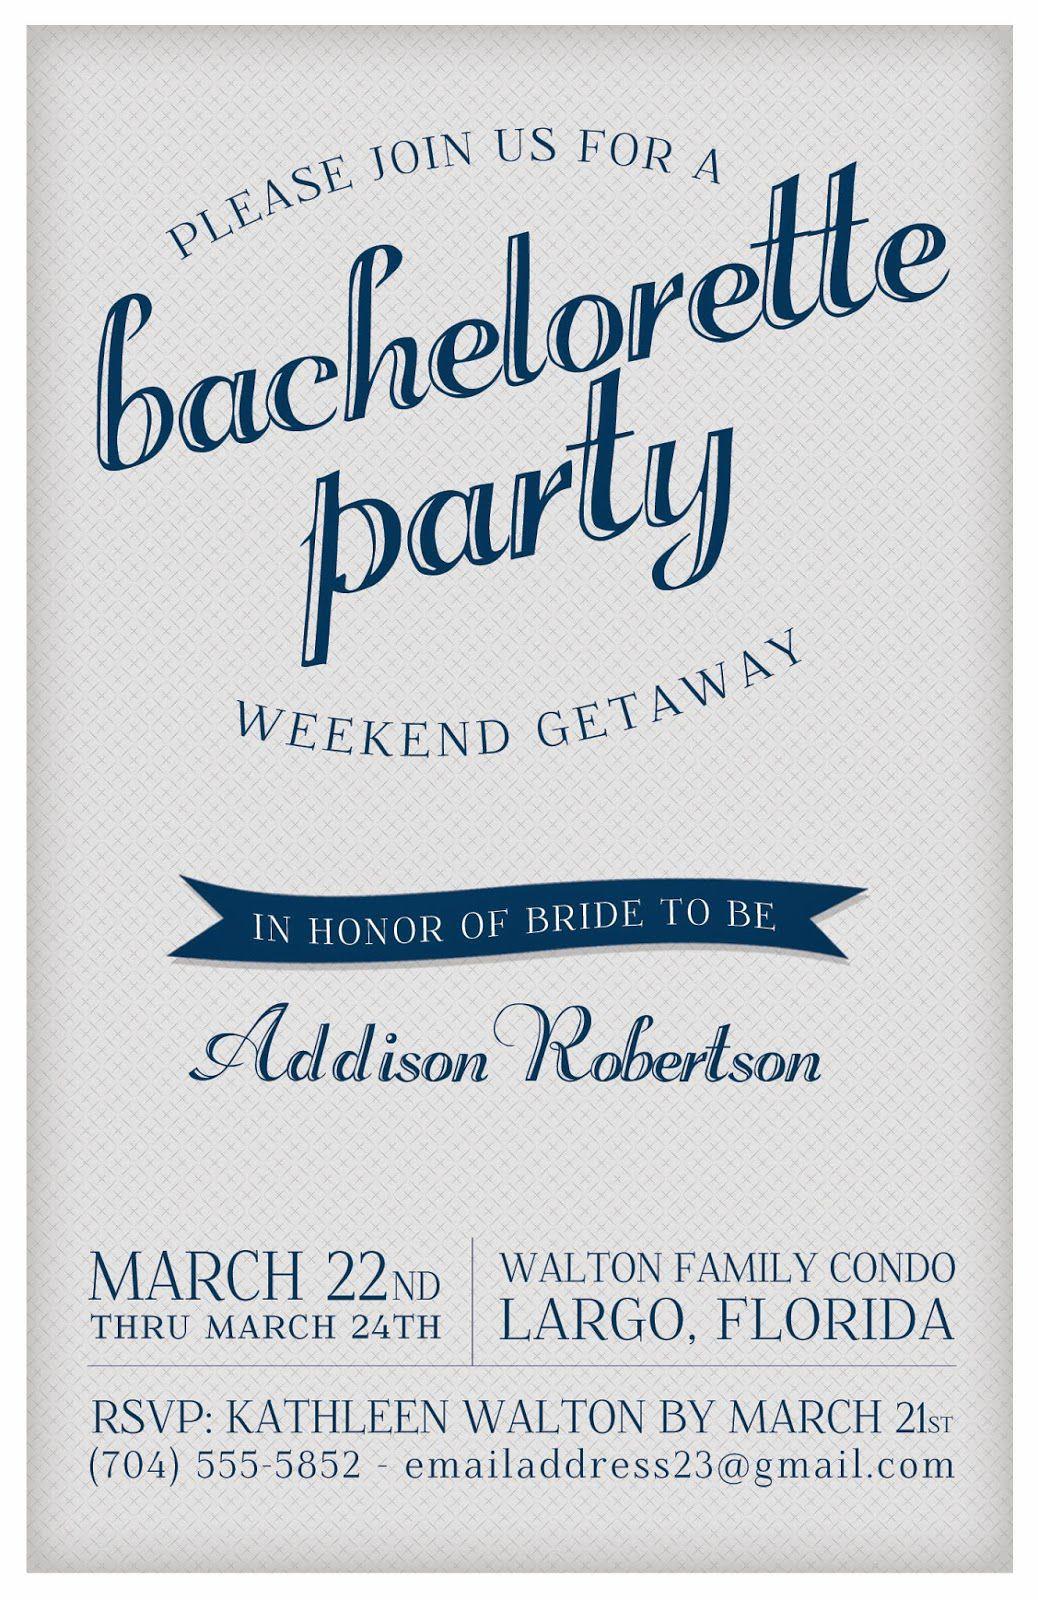 9 Free, Printable Bachelorette Party Invitations